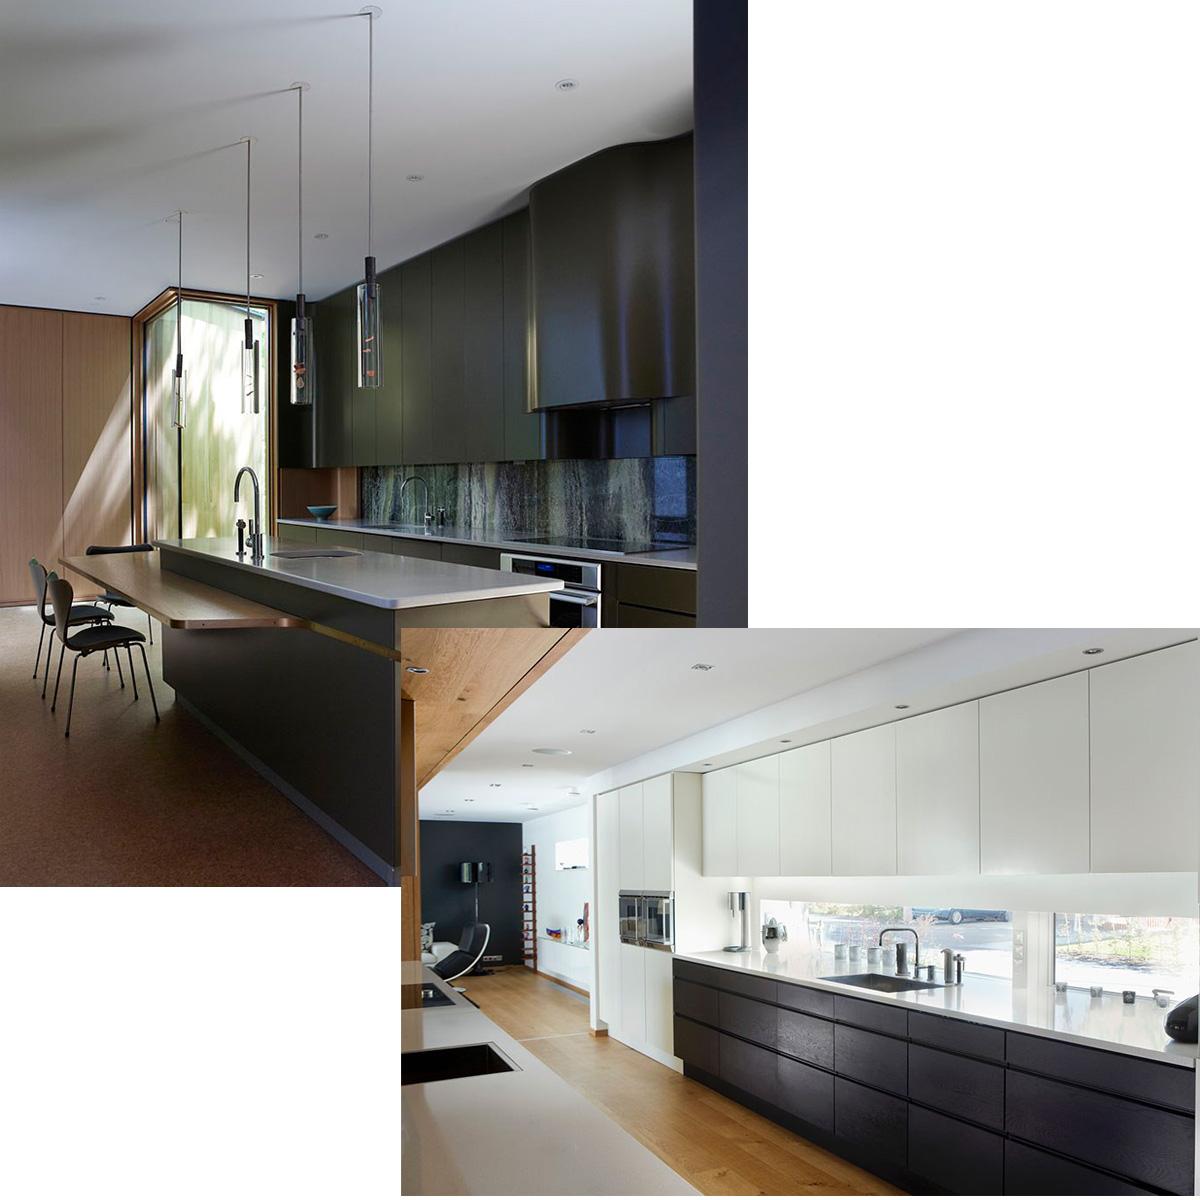 10m x 61cm m belfolie klebefolie bad k che folie schrankfolie k chenfolie ebay. Black Bedroom Furniture Sets. Home Design Ideas